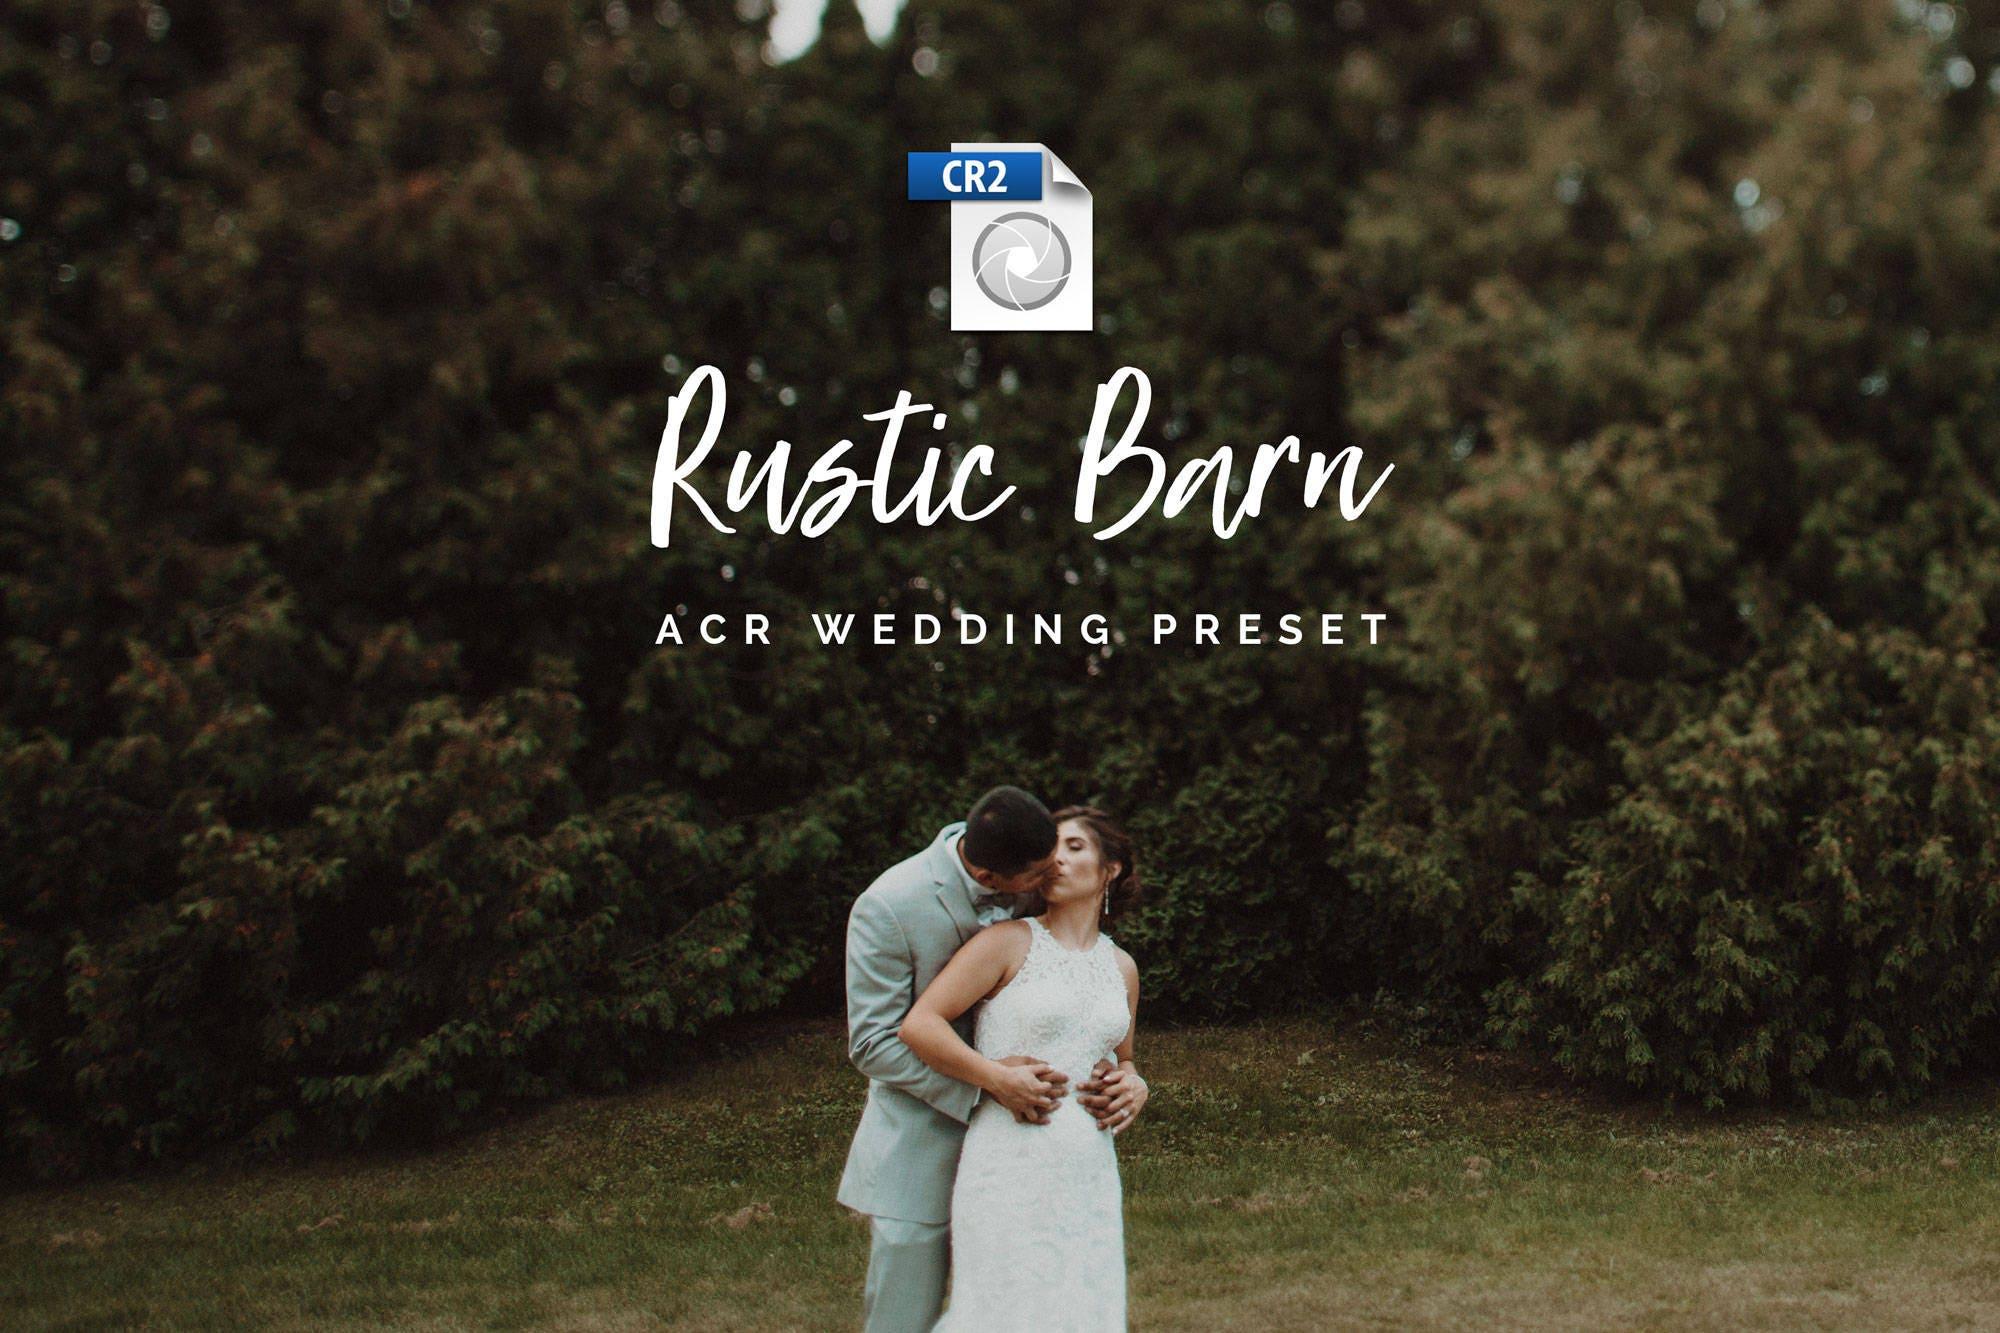 Moody Tones Wedding Adobe Camera Raw Preset, Photoshop Preset, Dark Film  Style, Rustic Film Preset